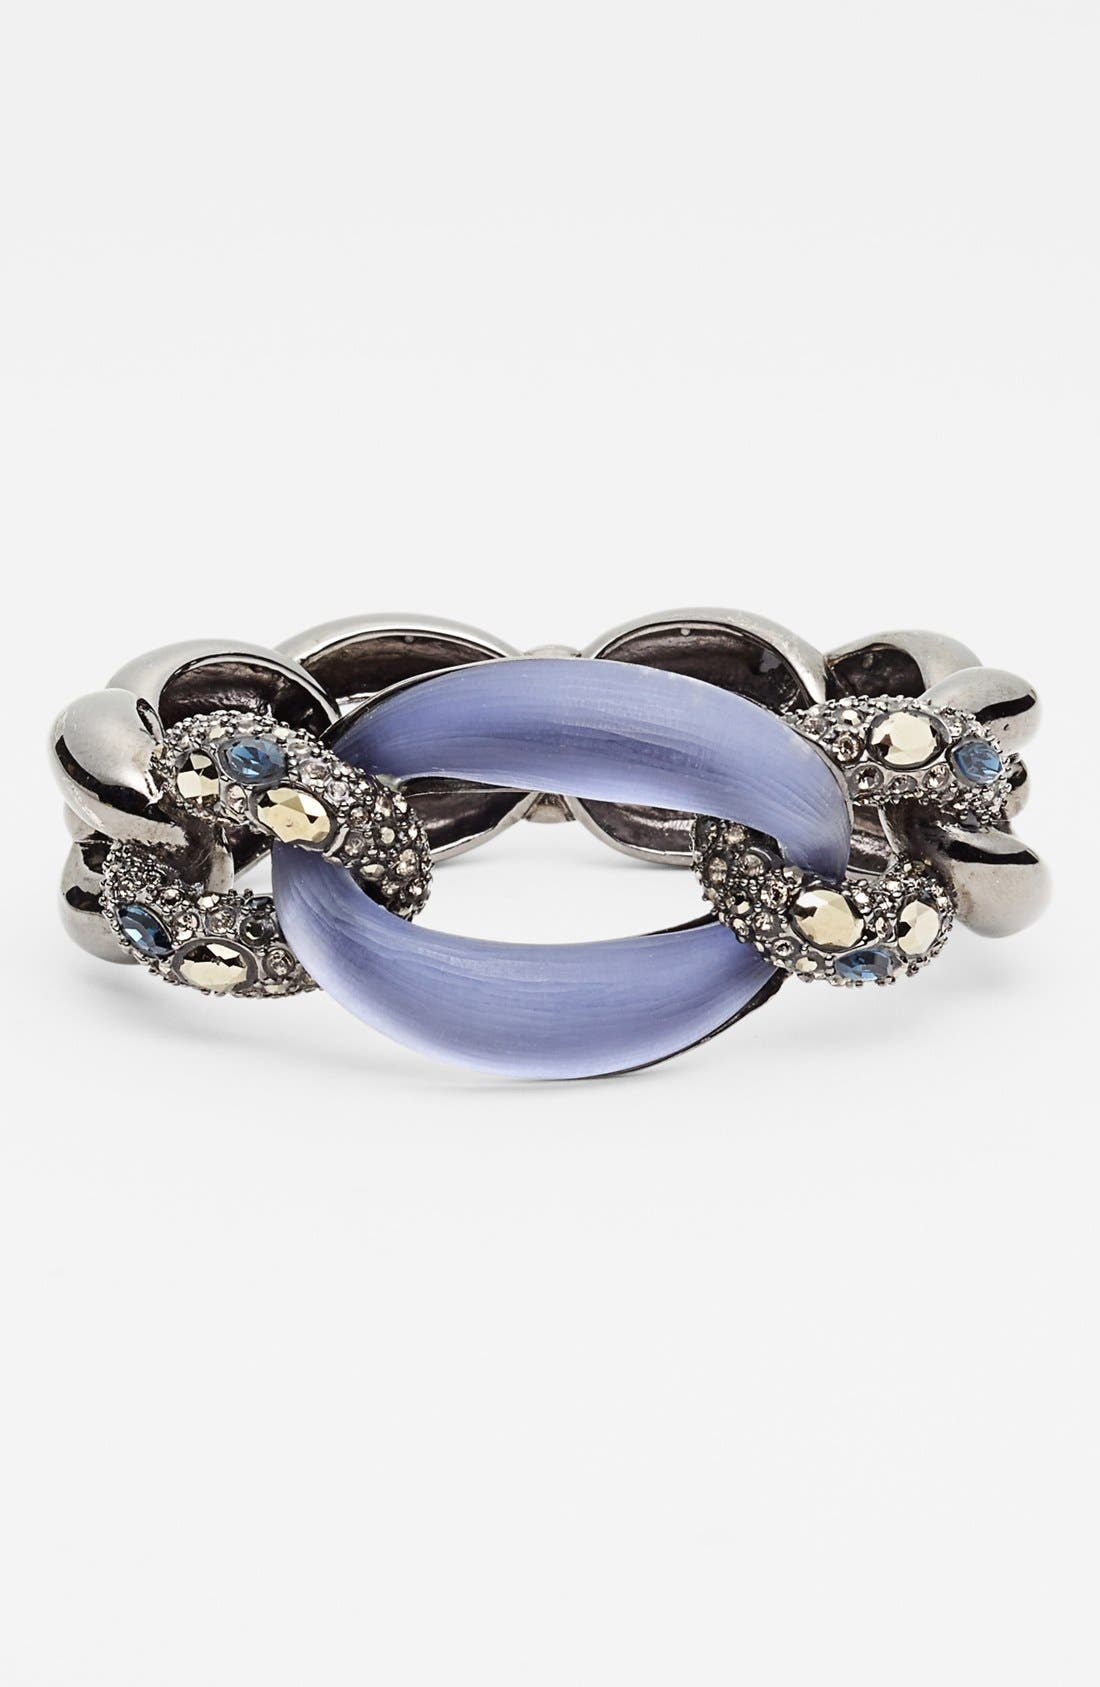 Main Image - Alexis Bittar 'Lucite® - Neo Bohemian' Link Hinged Bracelet